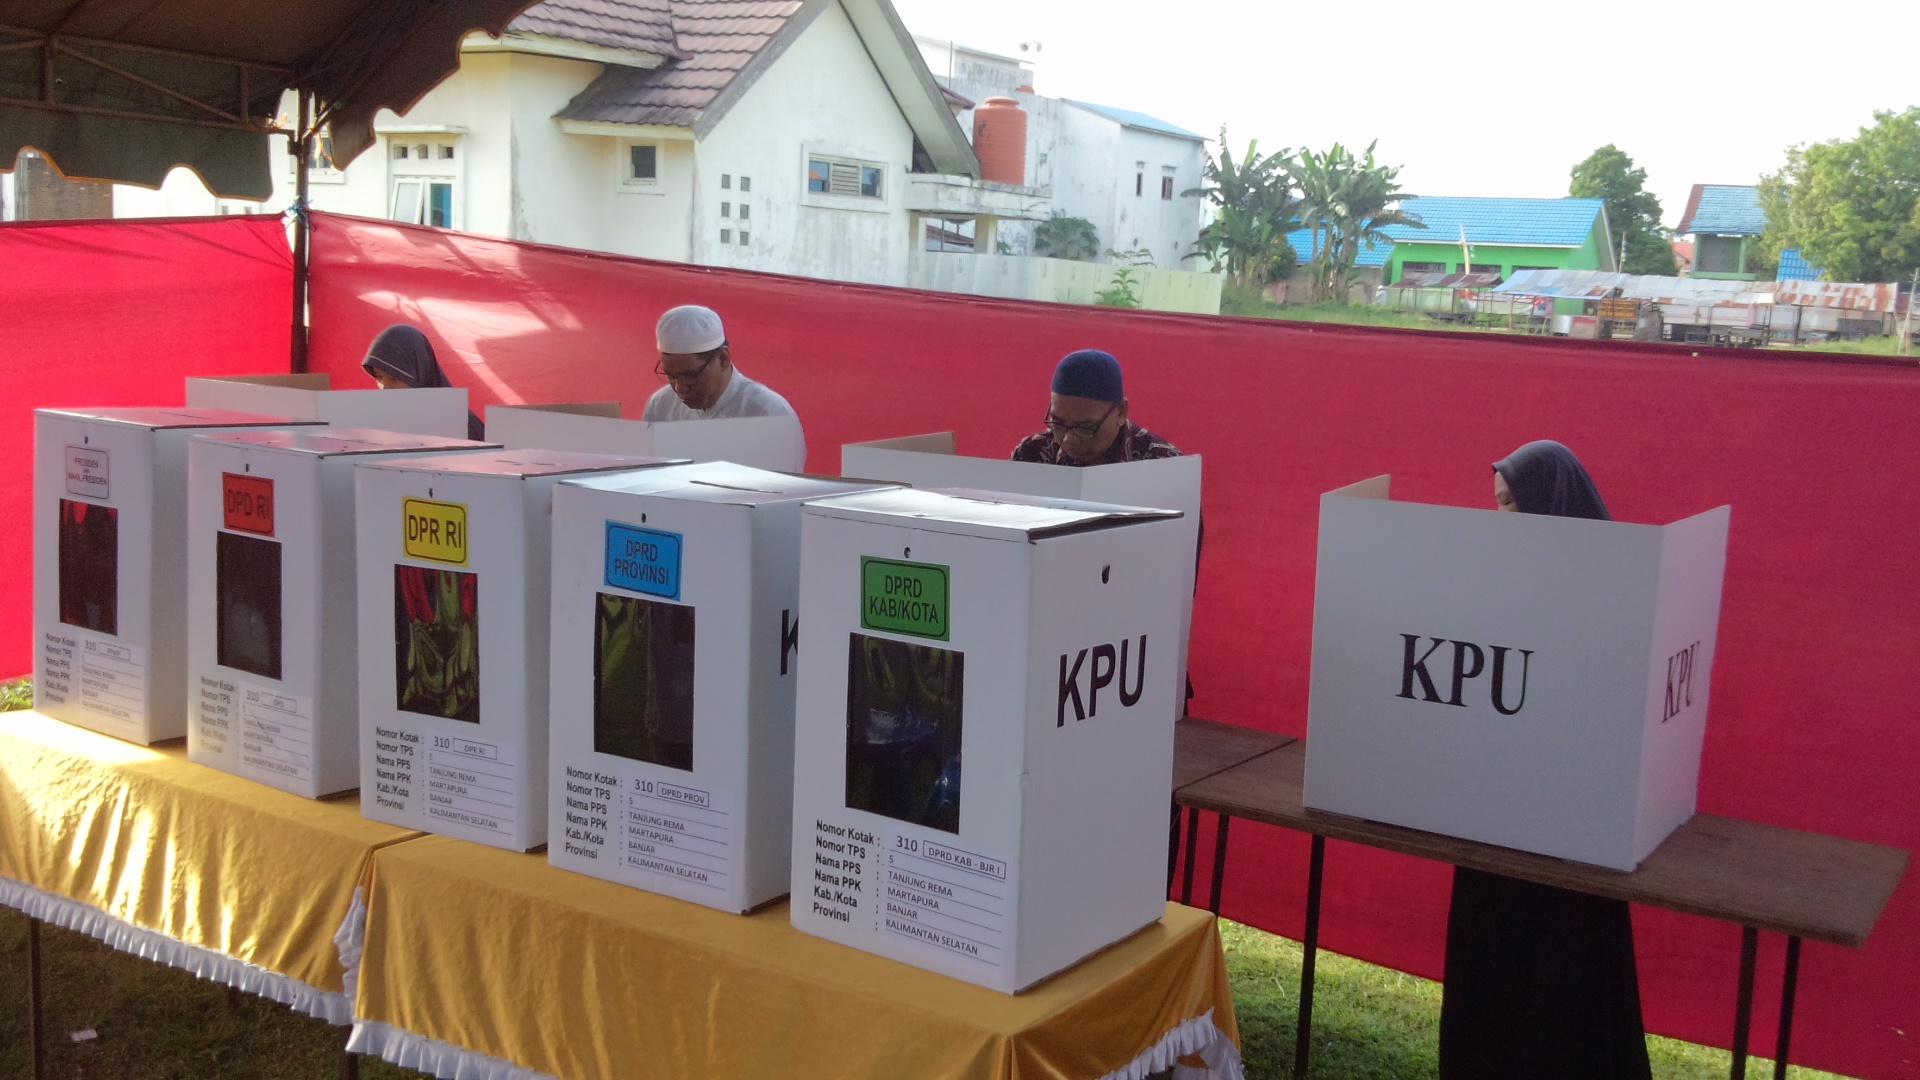 Demokrat Siap Berkoalisi Dalam Pilkada Kabupaten Banjar, Golkar Belum Tentukan Sikap 3